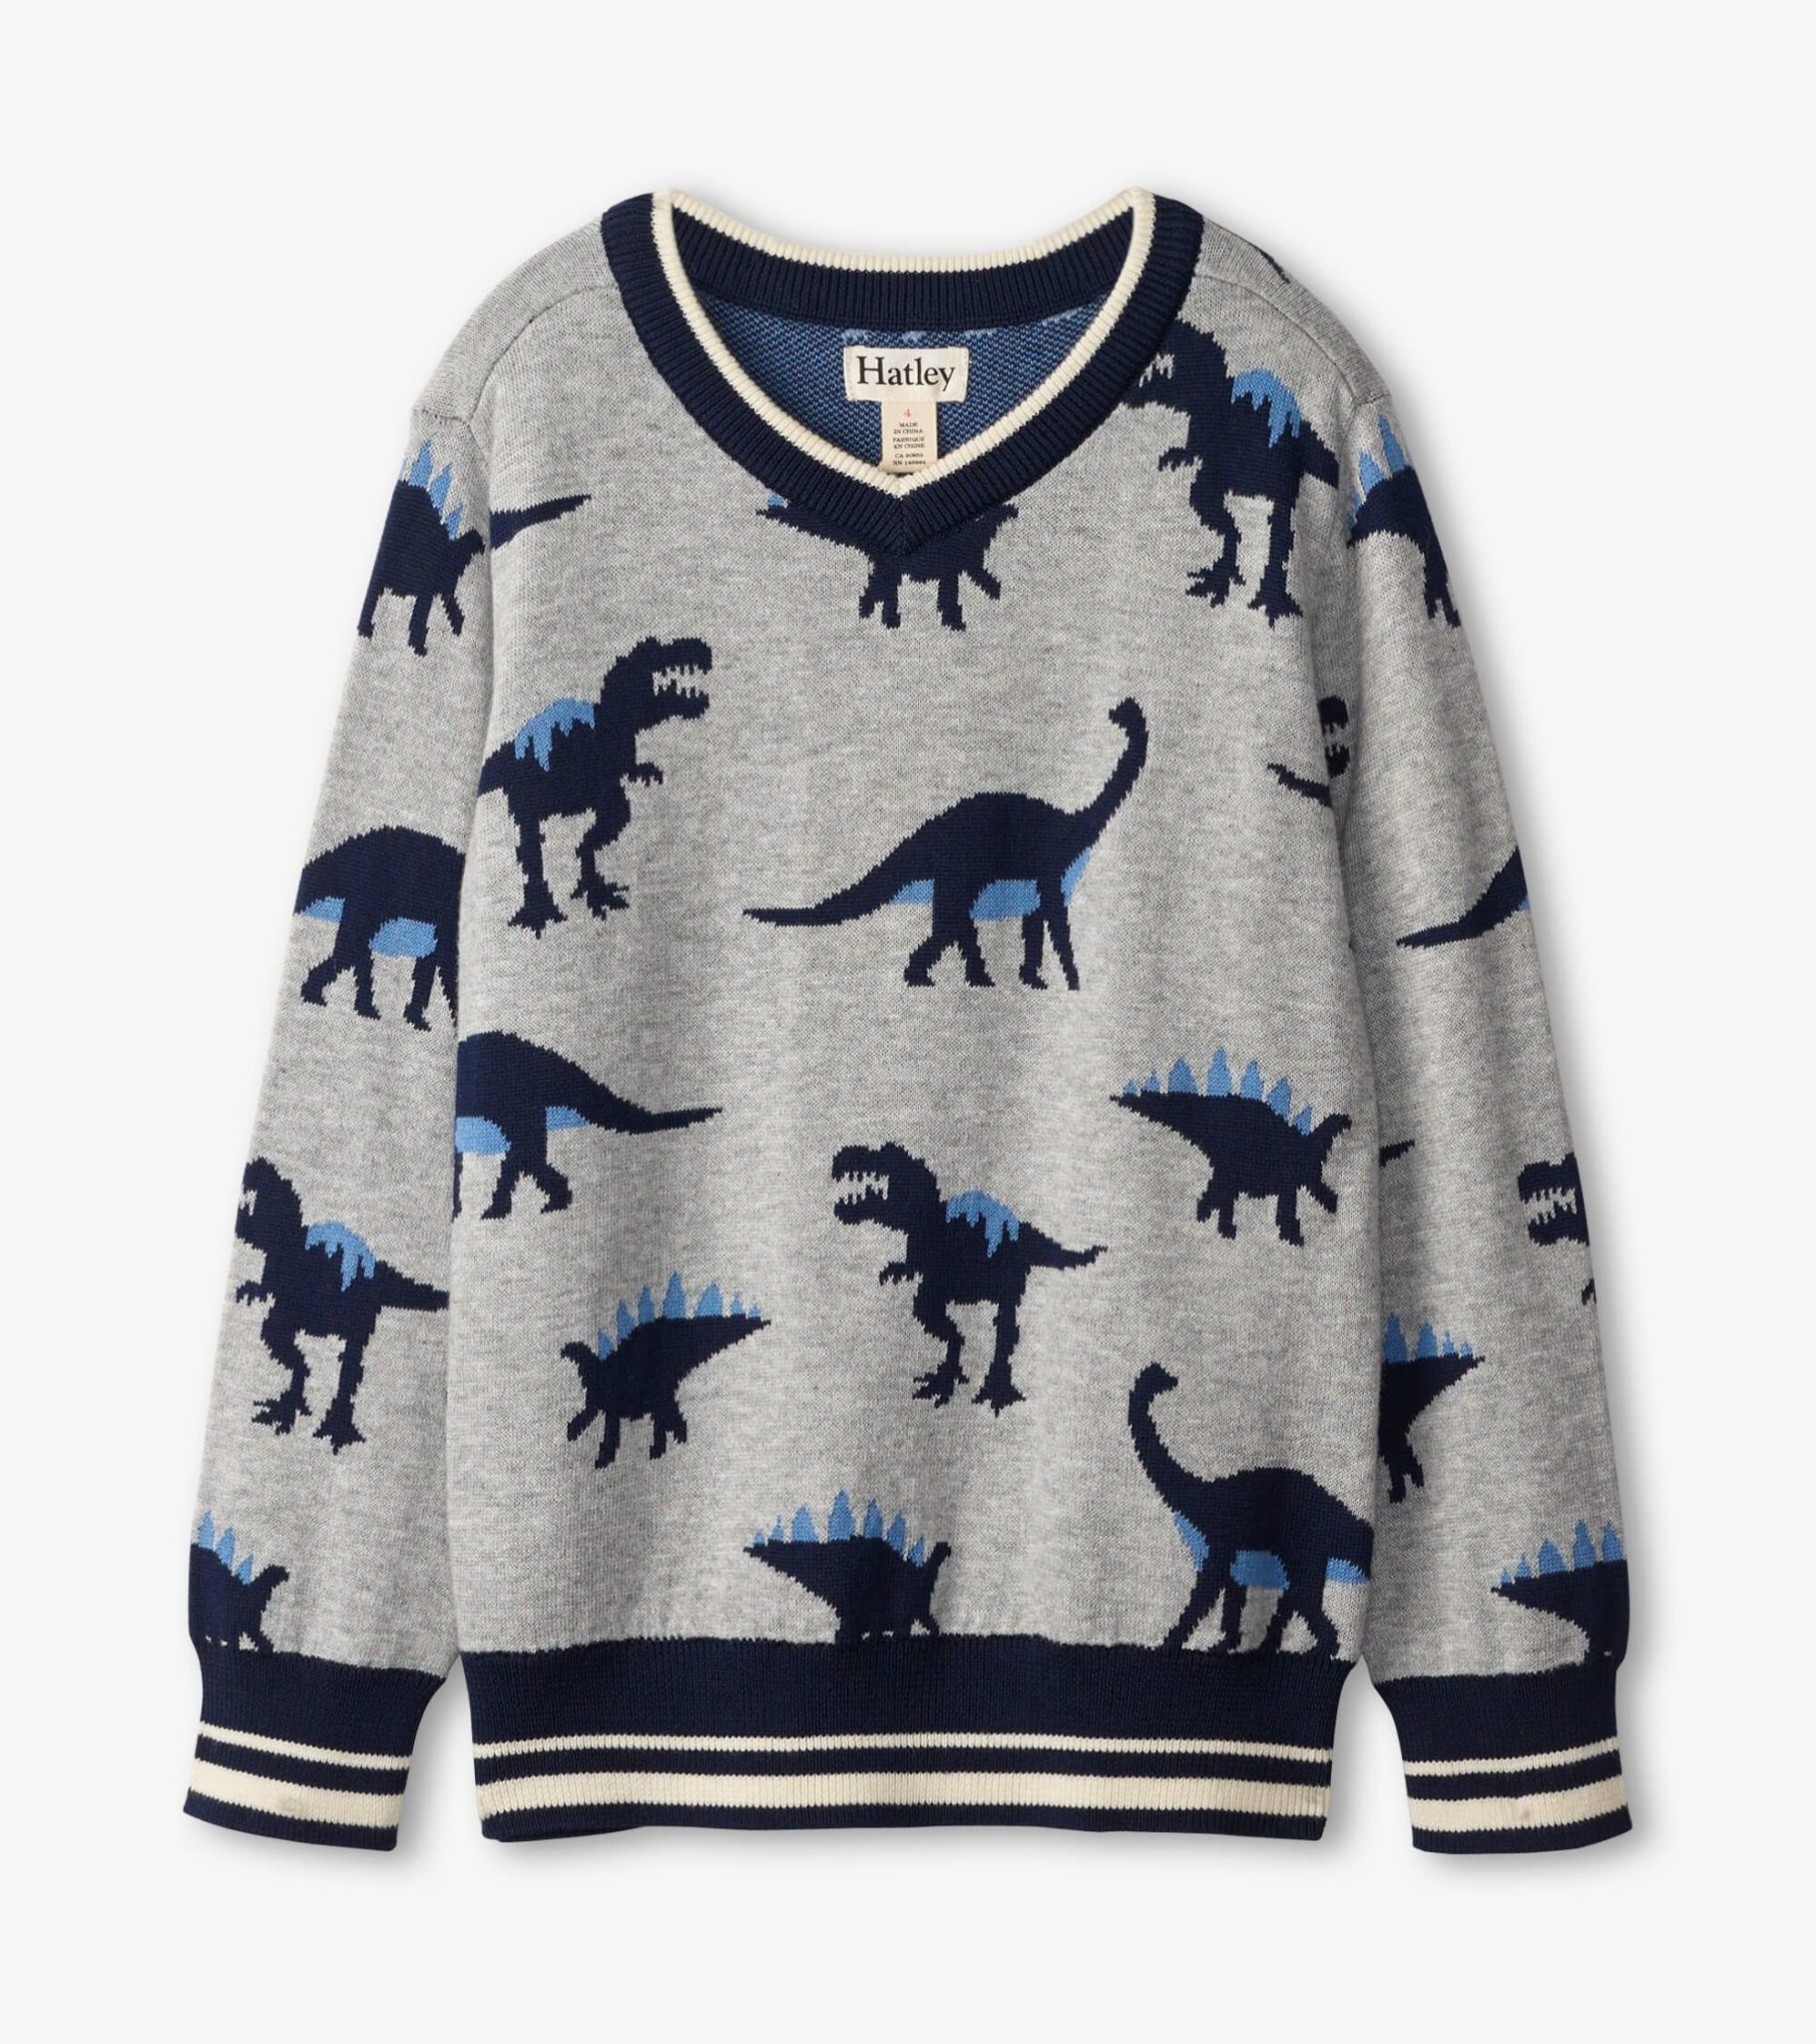 Hatley Hatley Dino Herb V-Neck Sweater